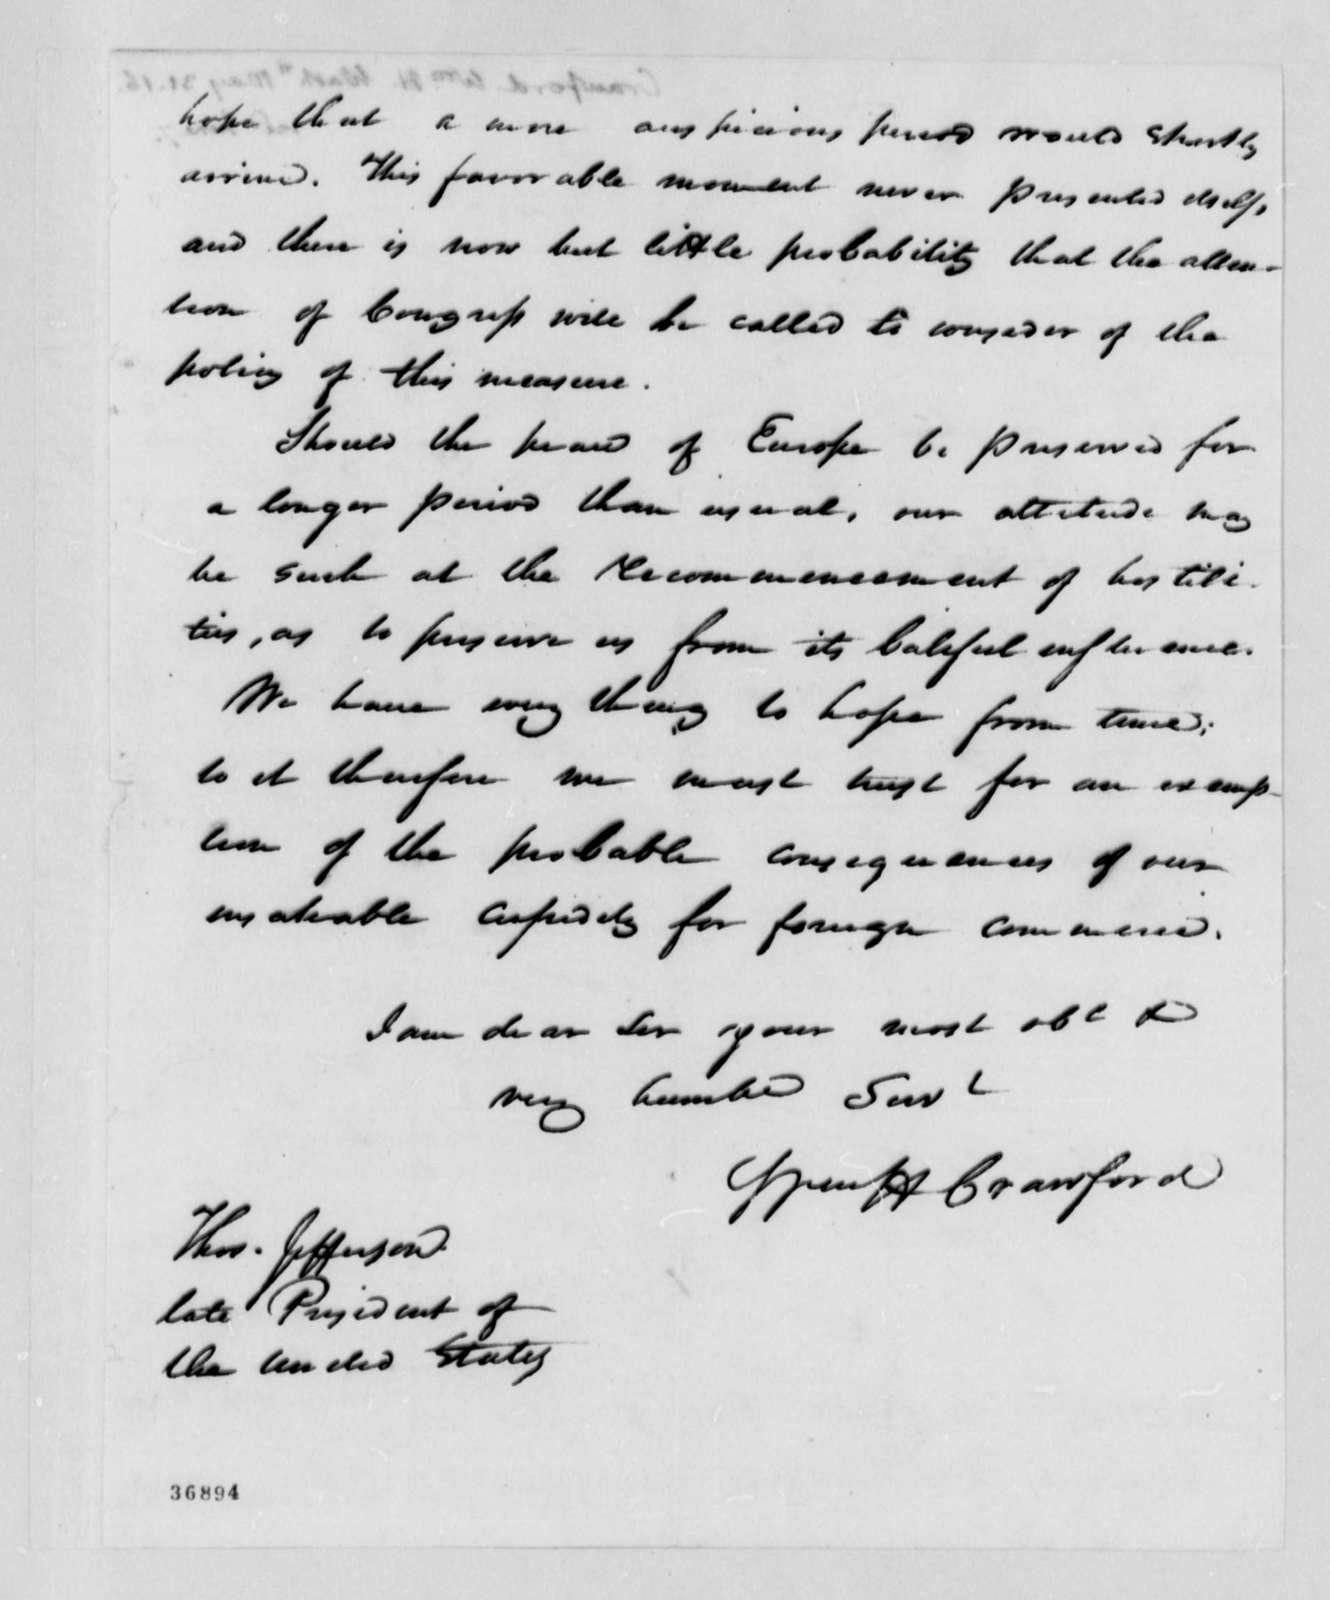 William H. Crawford to Thomas Jefferson, May 31, 1816